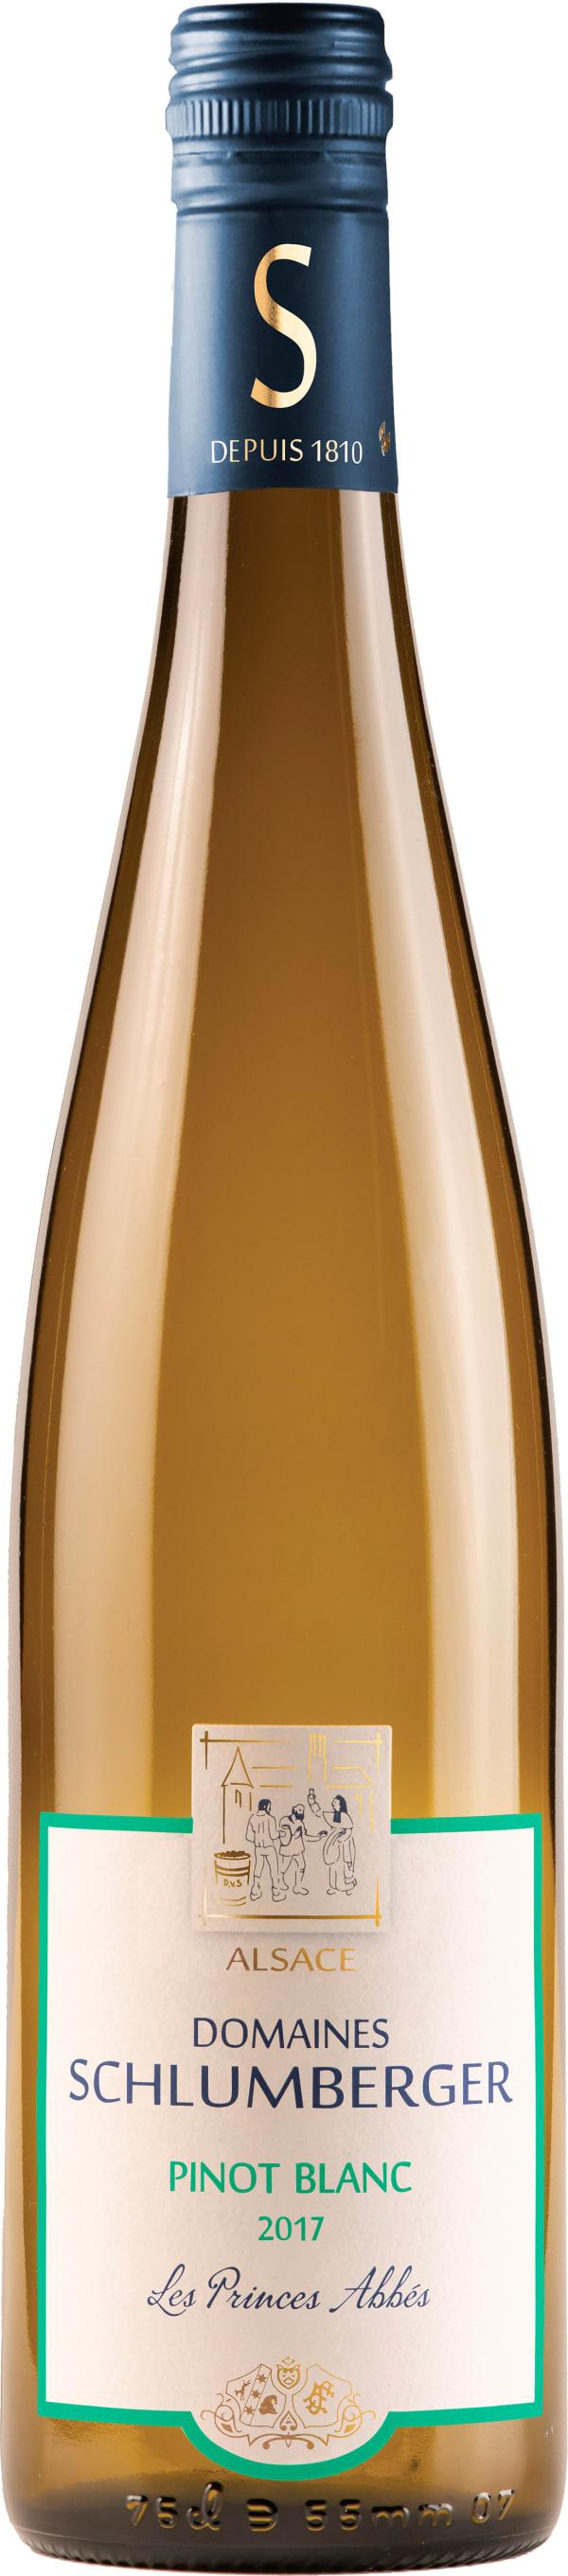 Domaines Schlumberger Pinot Blanc Les Princes Abbés 2017